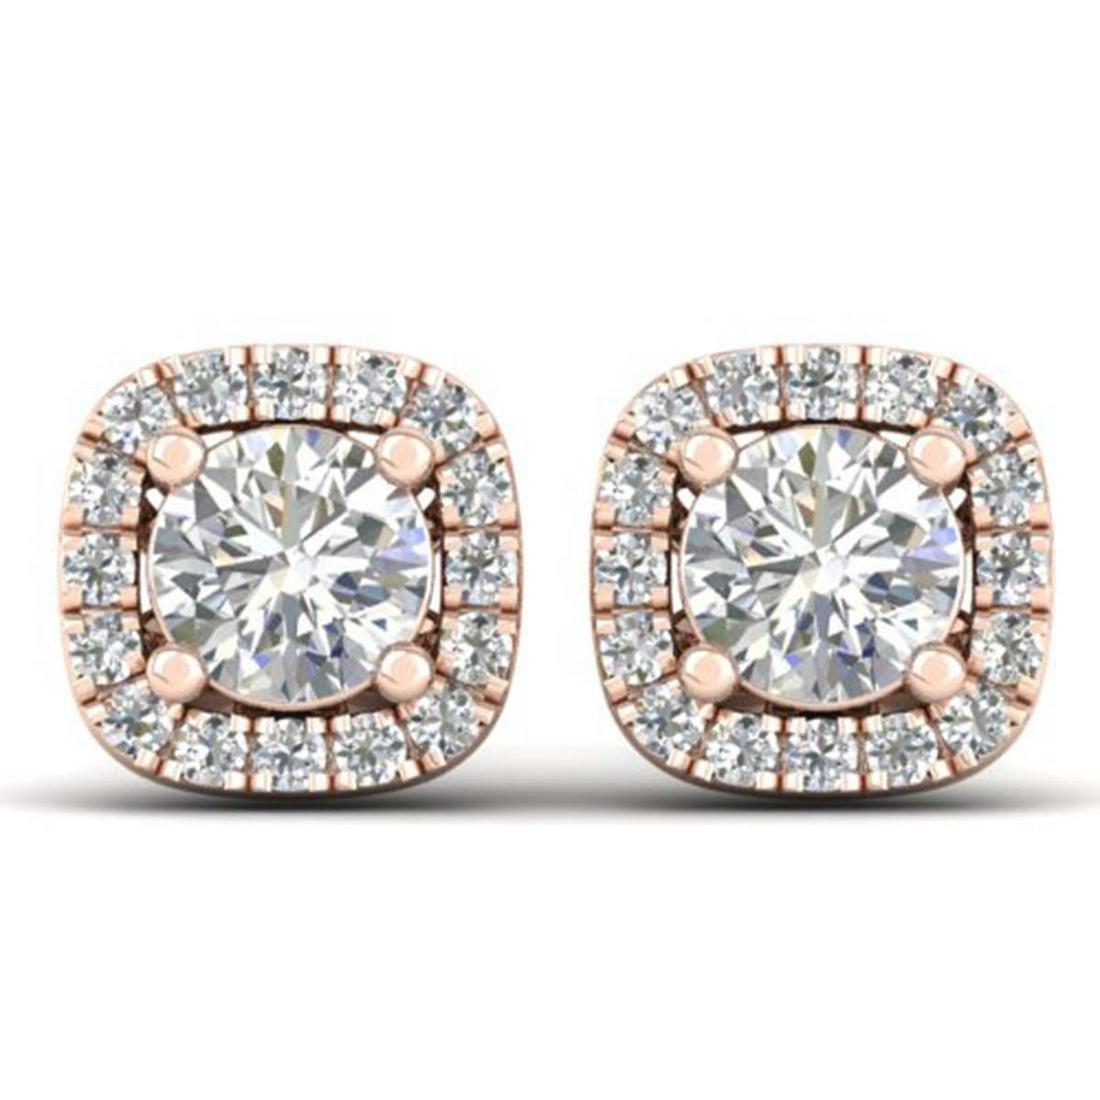 1.08 ctw VS/SI Diamond Stud Halo Earrings 18K Rose Gold